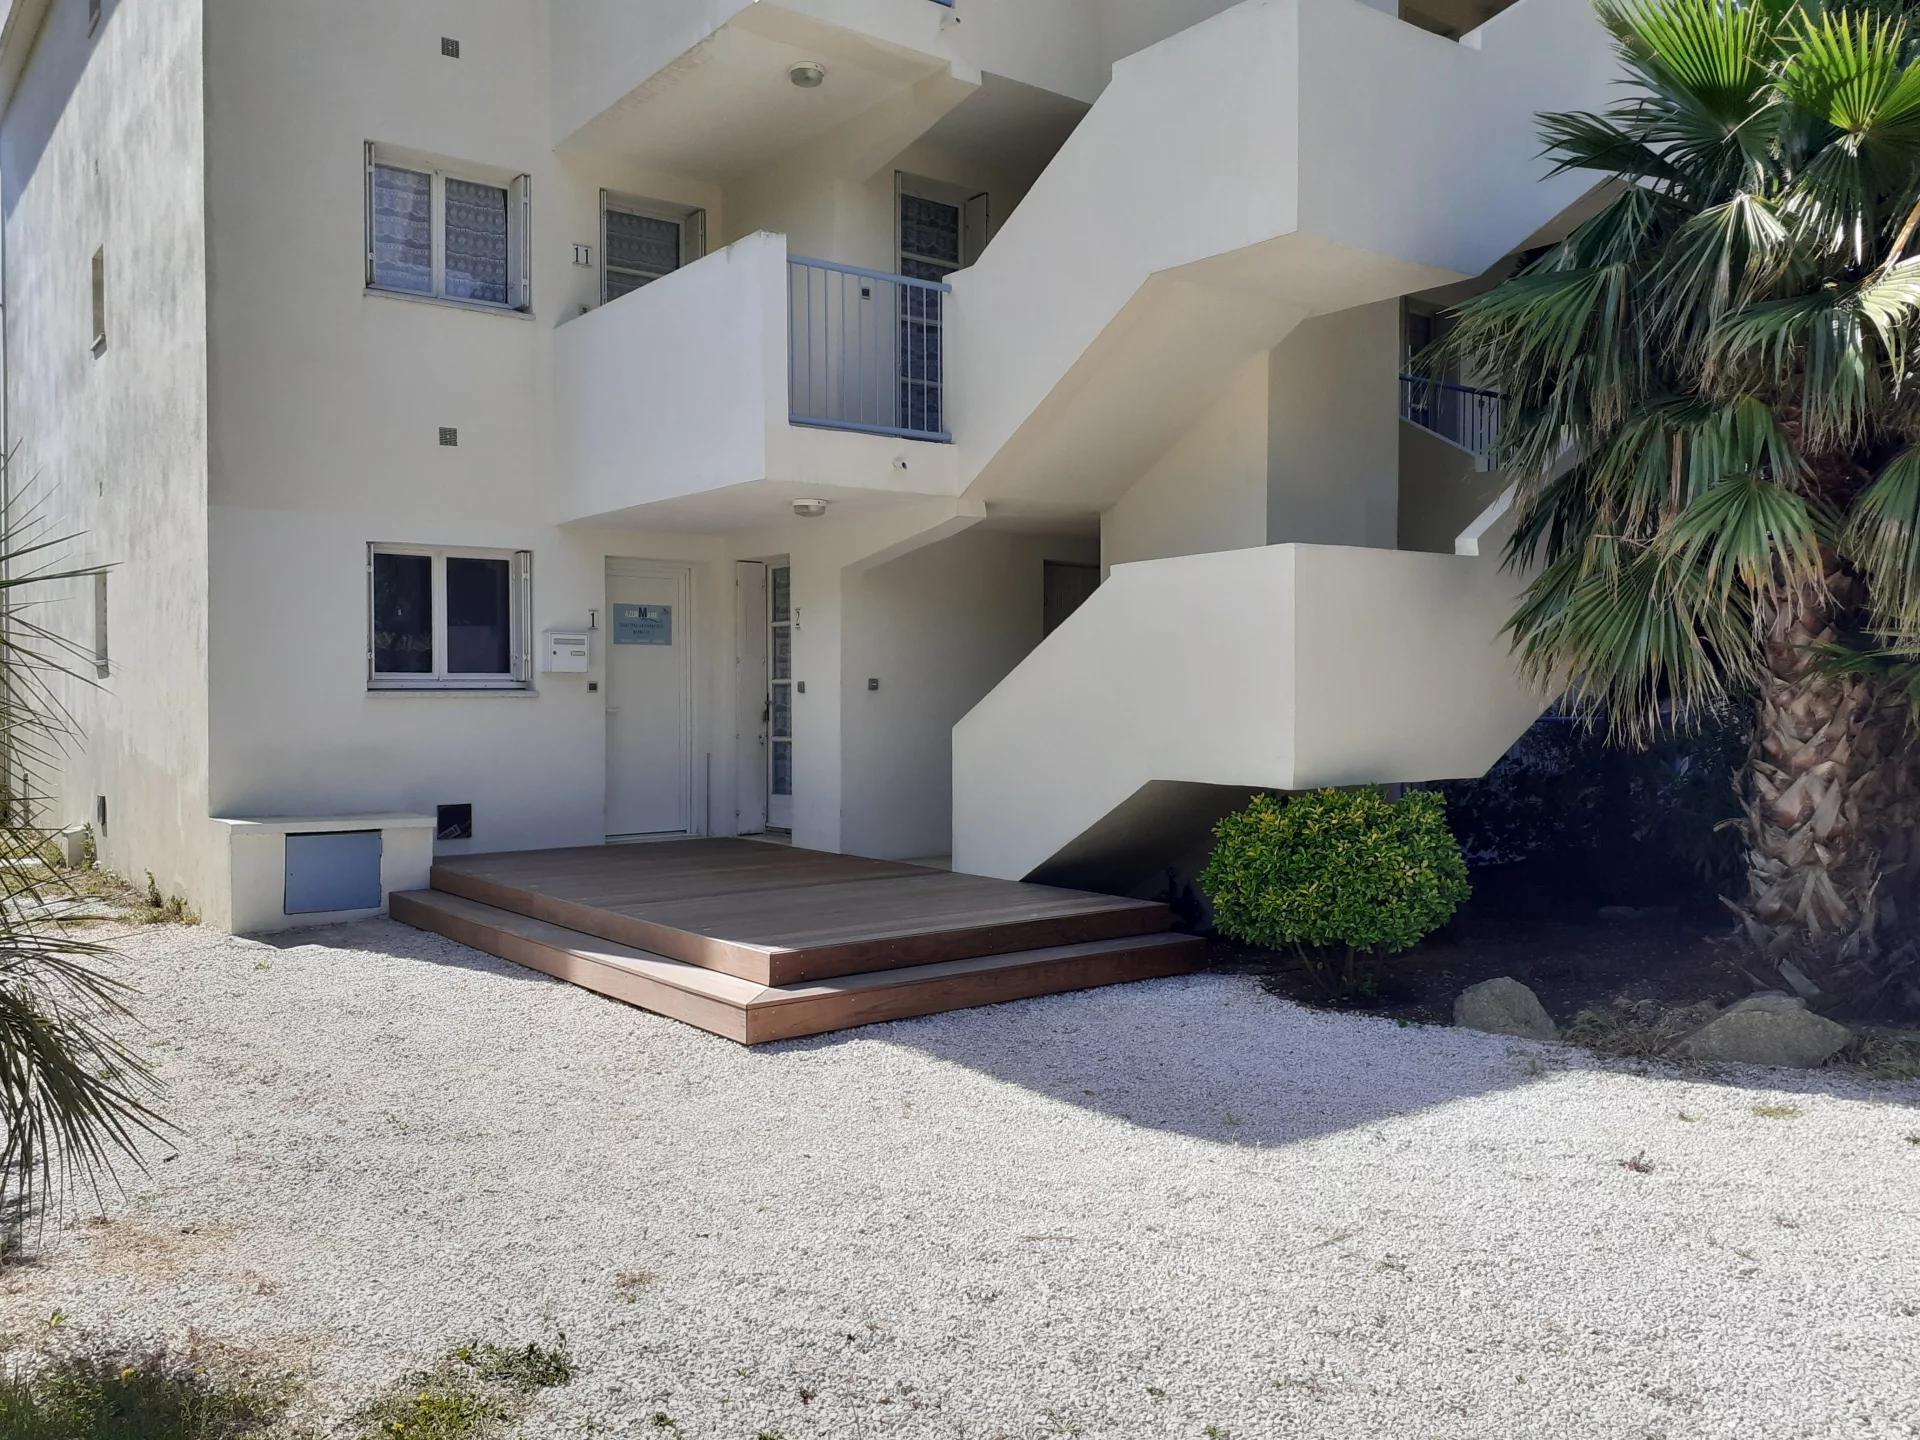 Seasonal rental Apartment - Le Lavandou